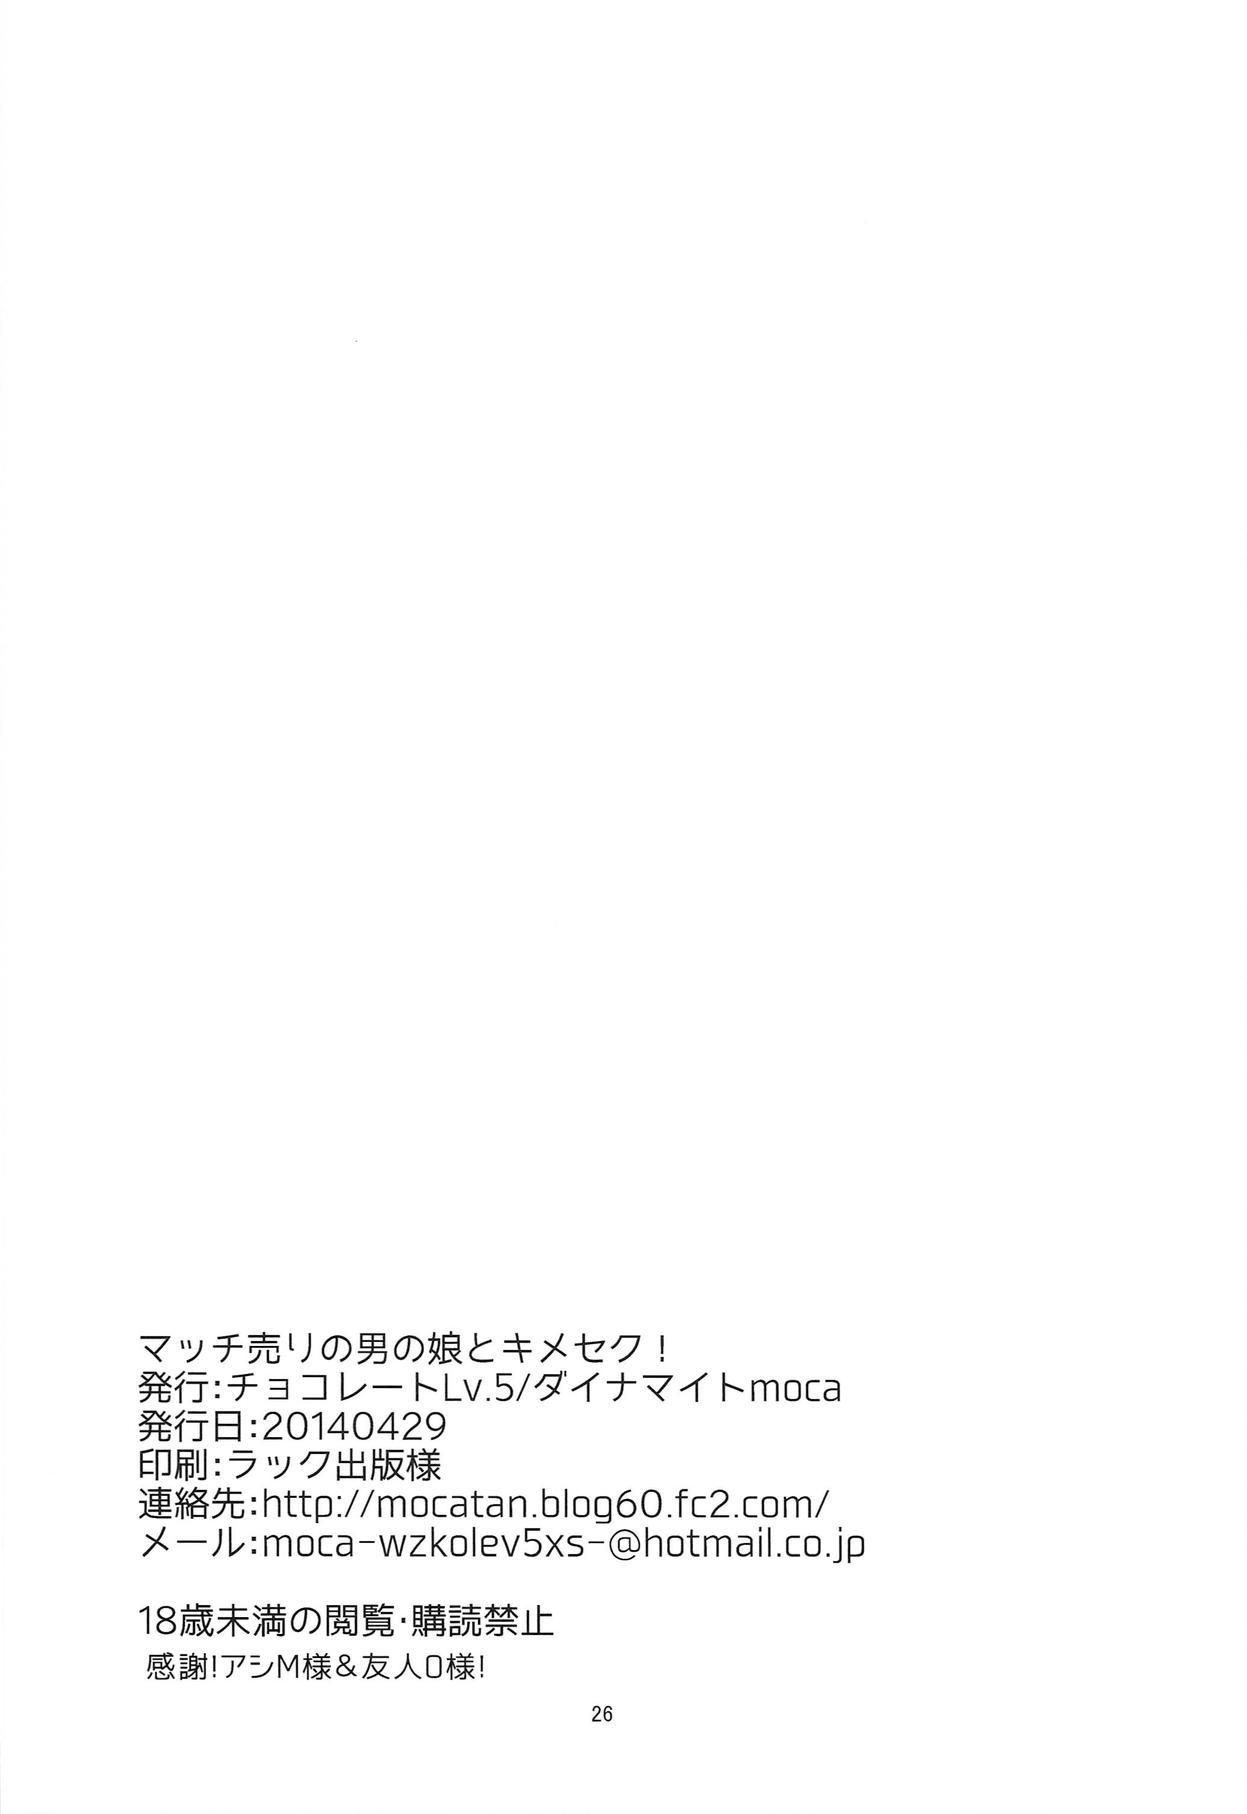 Match Uri no Otokonoko to Kime-seku! | Let's Drug and Fuck the Little Match Trap! 25